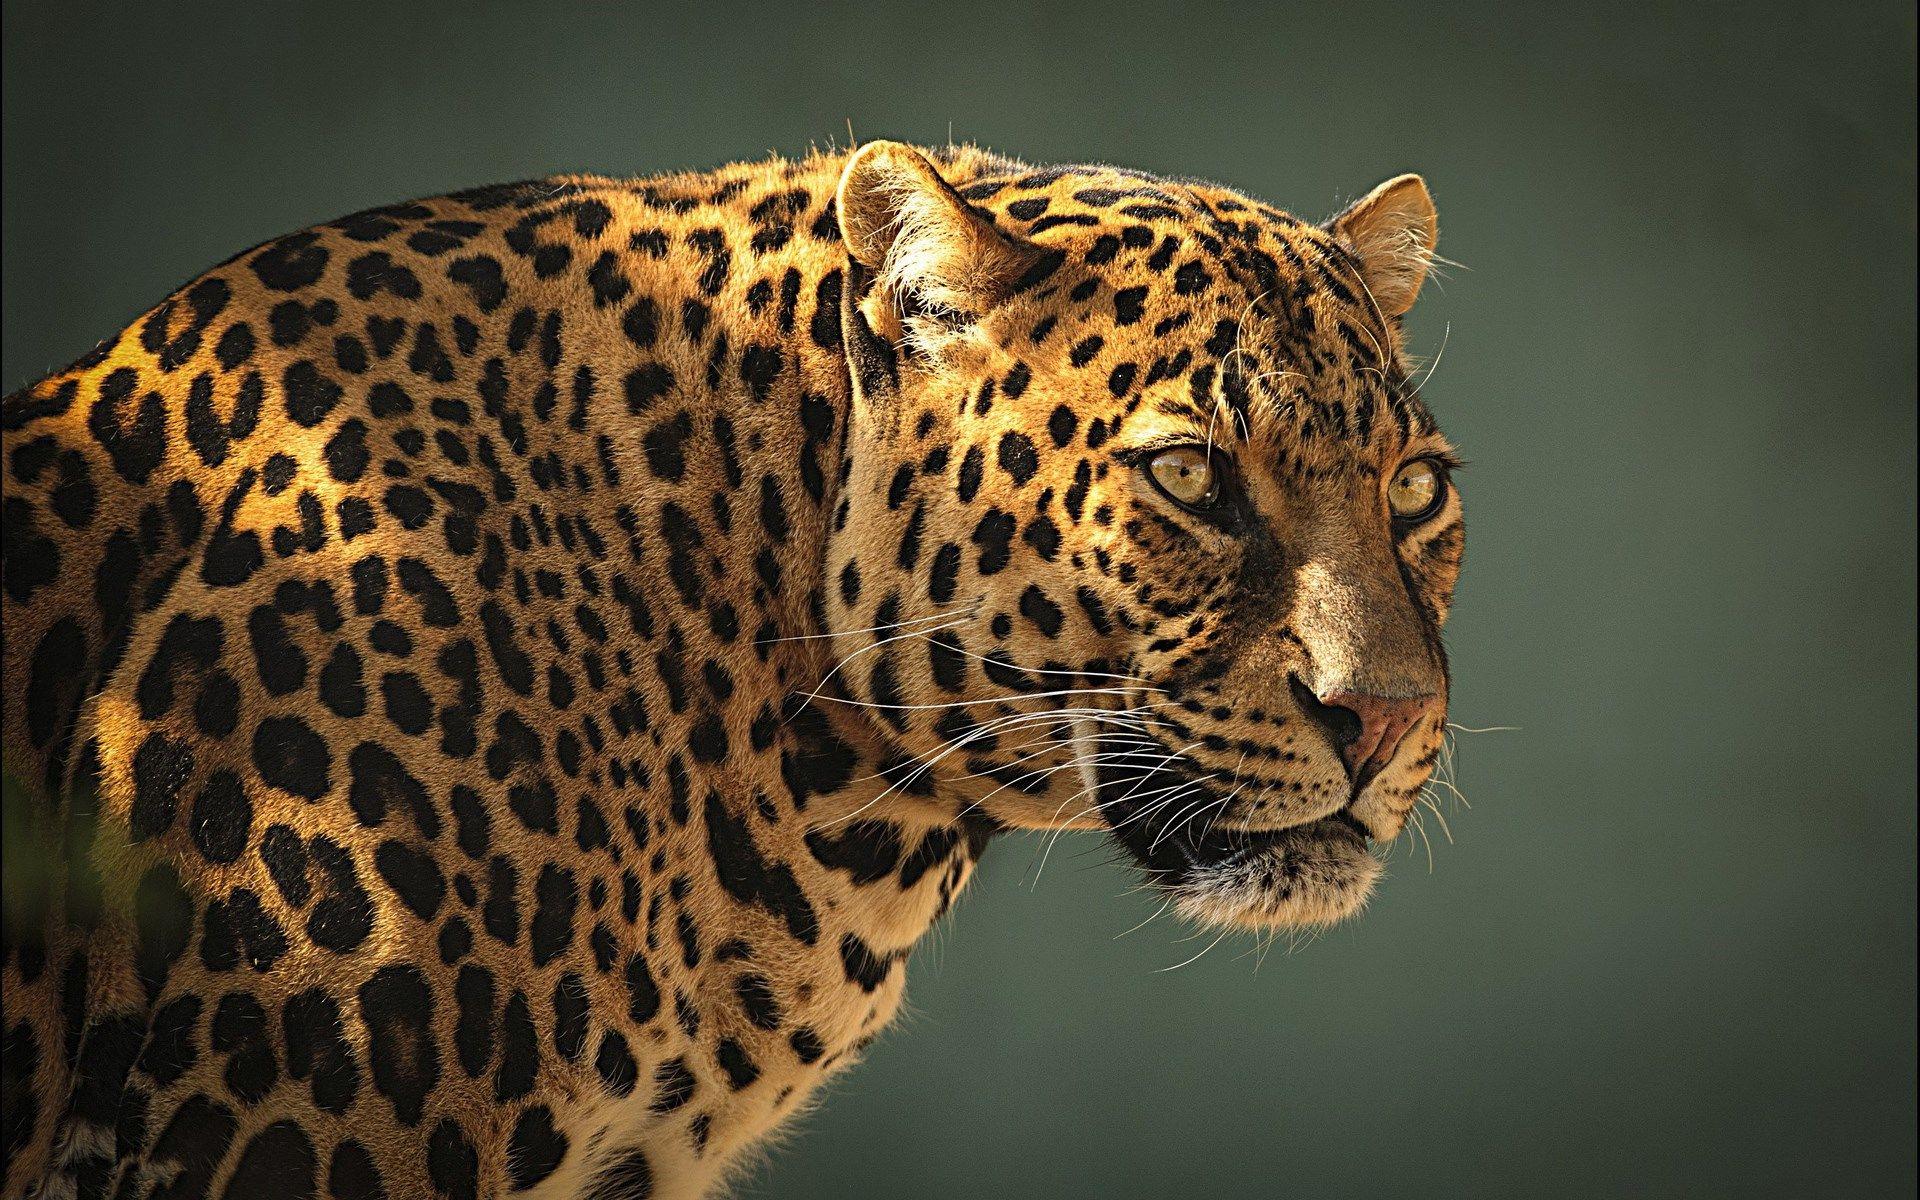 cheetah 4k ultra hd wallpaper o oshka Pinterest